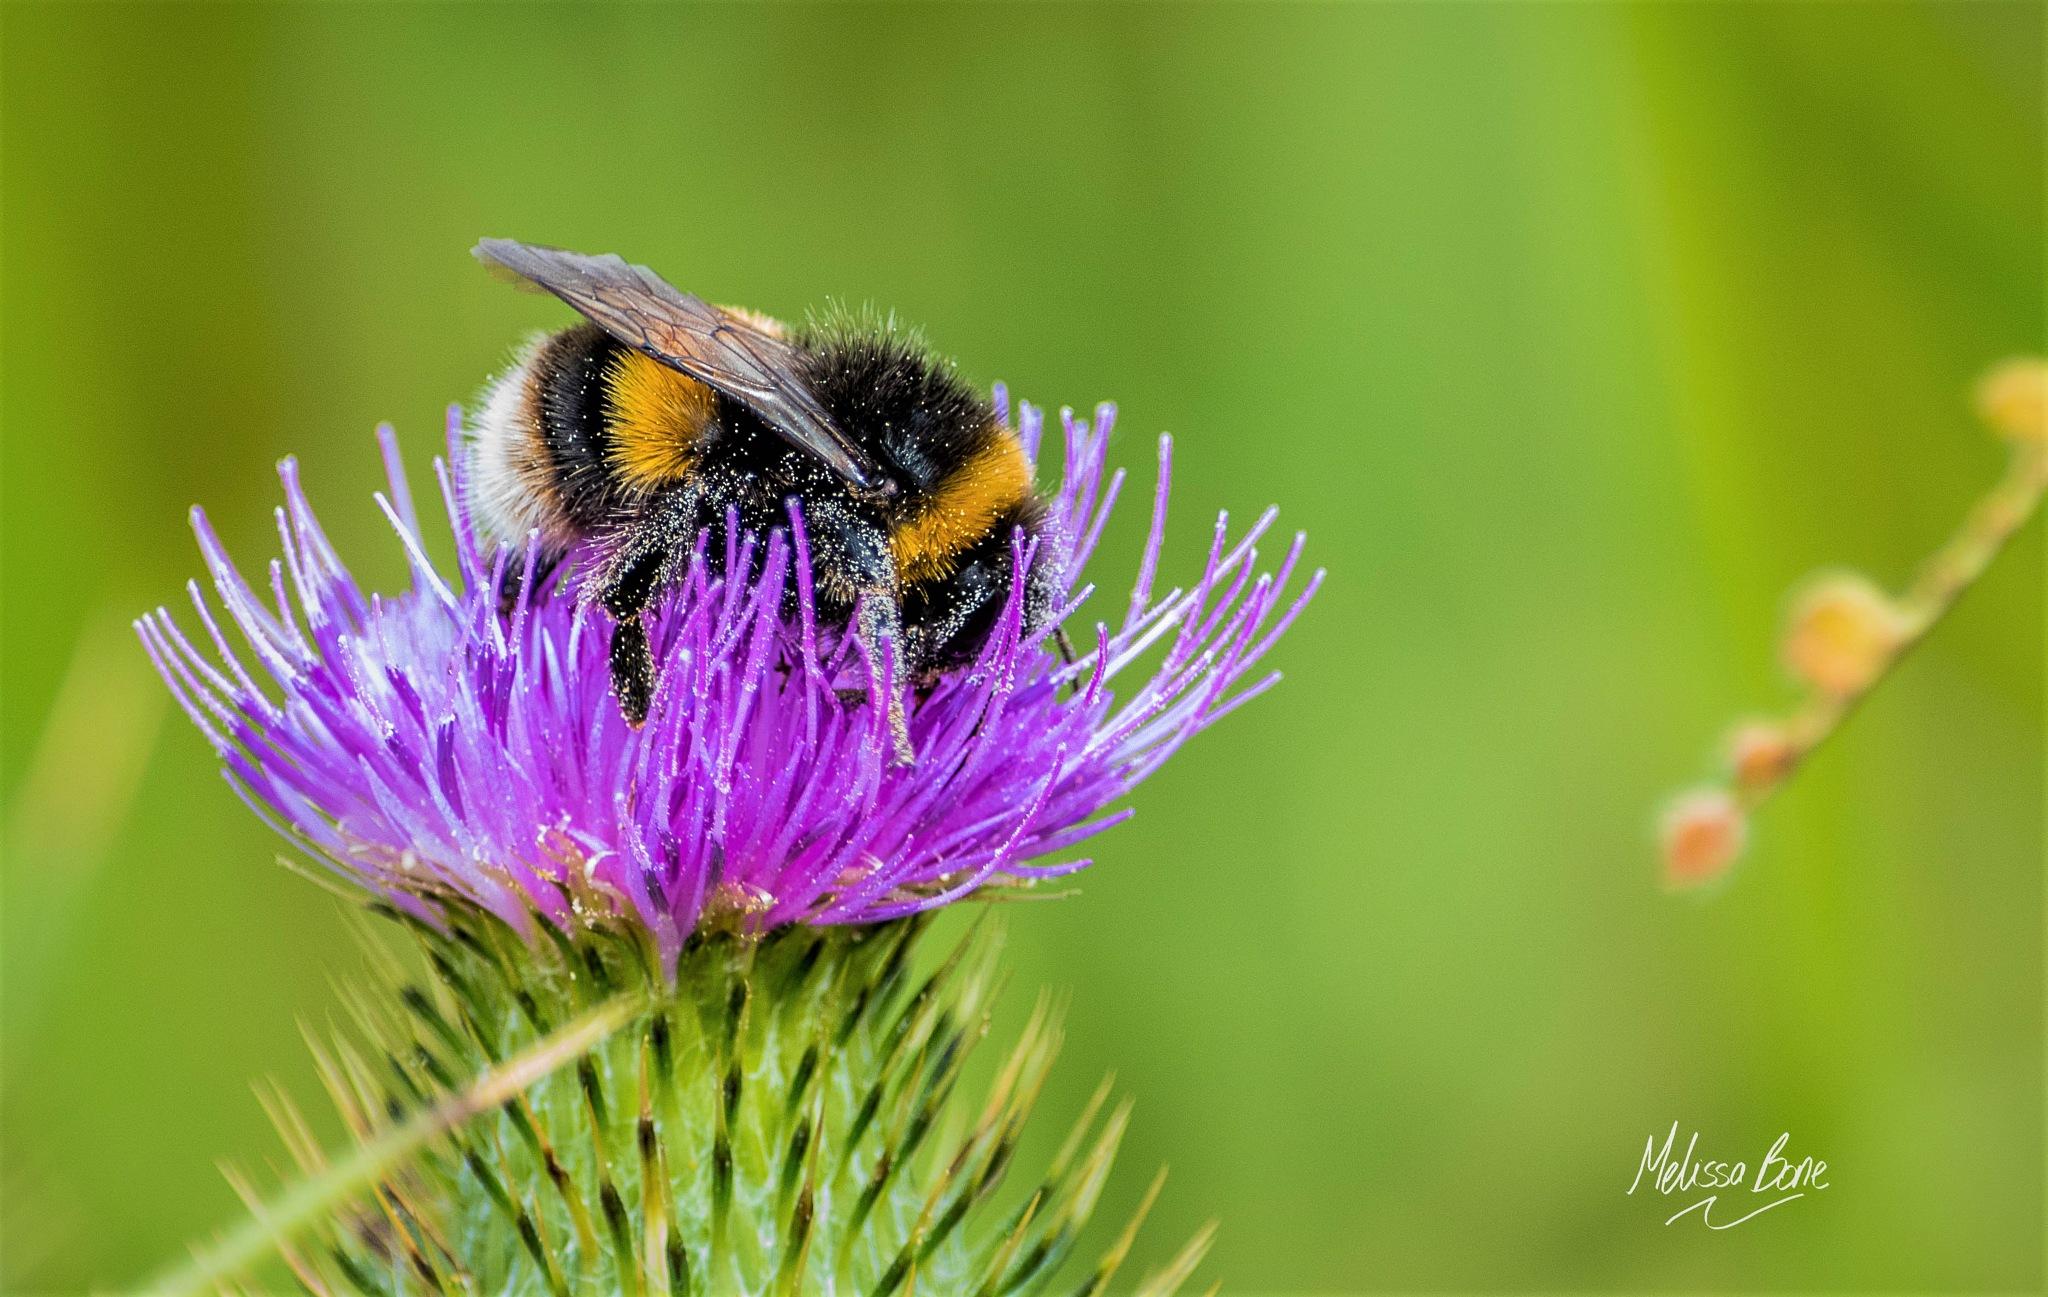 Humble bumble bee by Melissa Bone